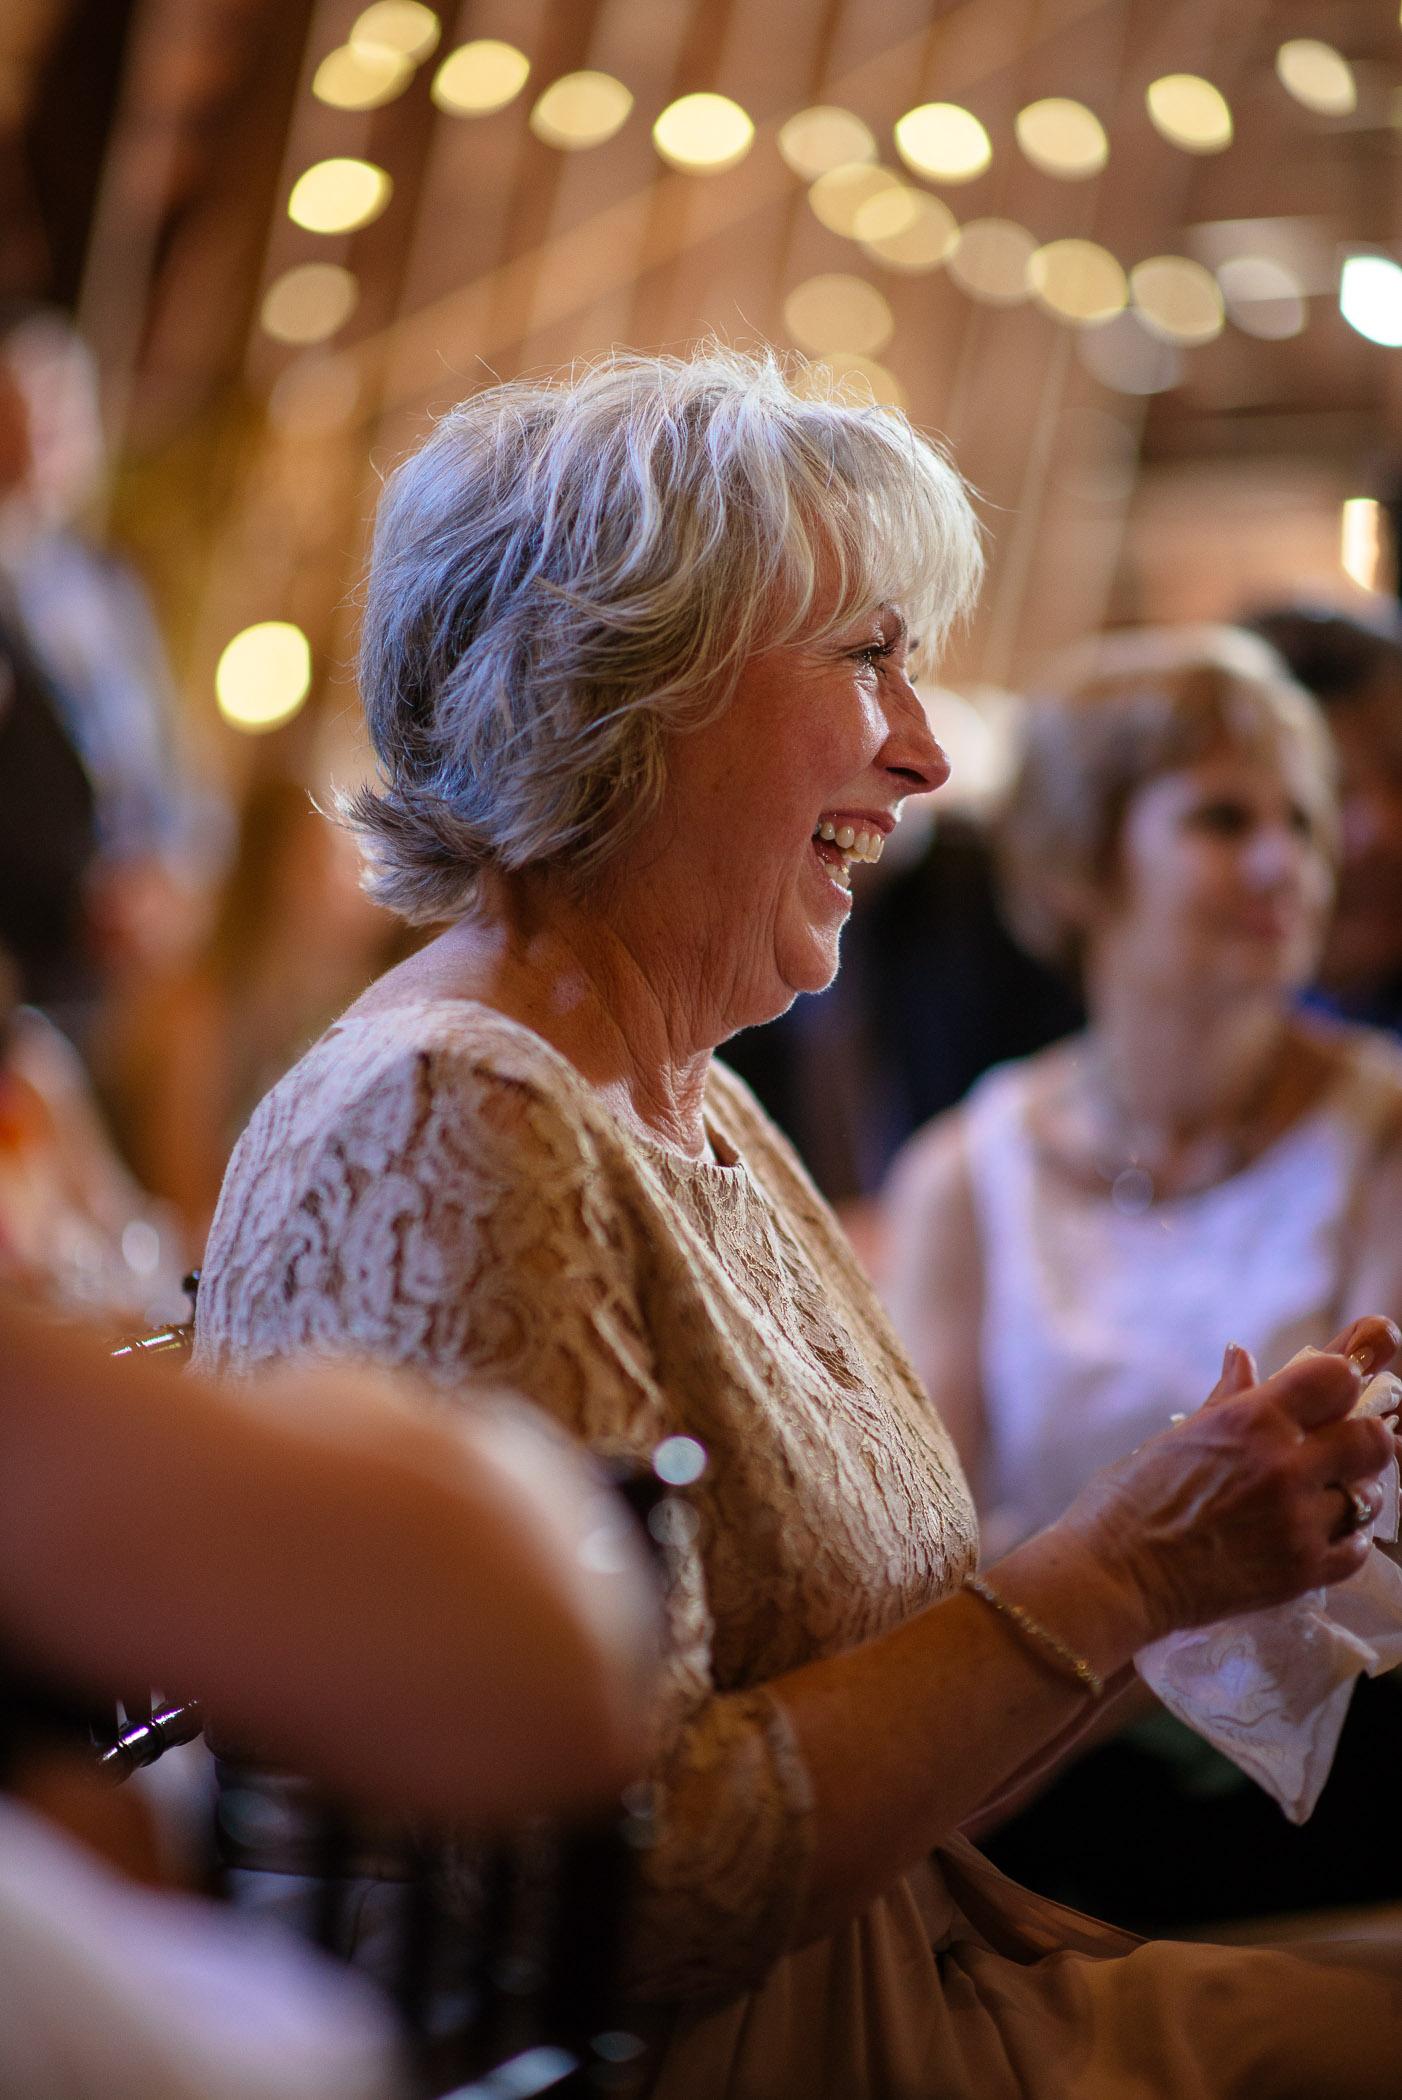 michigan_wedding_at_blue_dress_barn_036.jpg